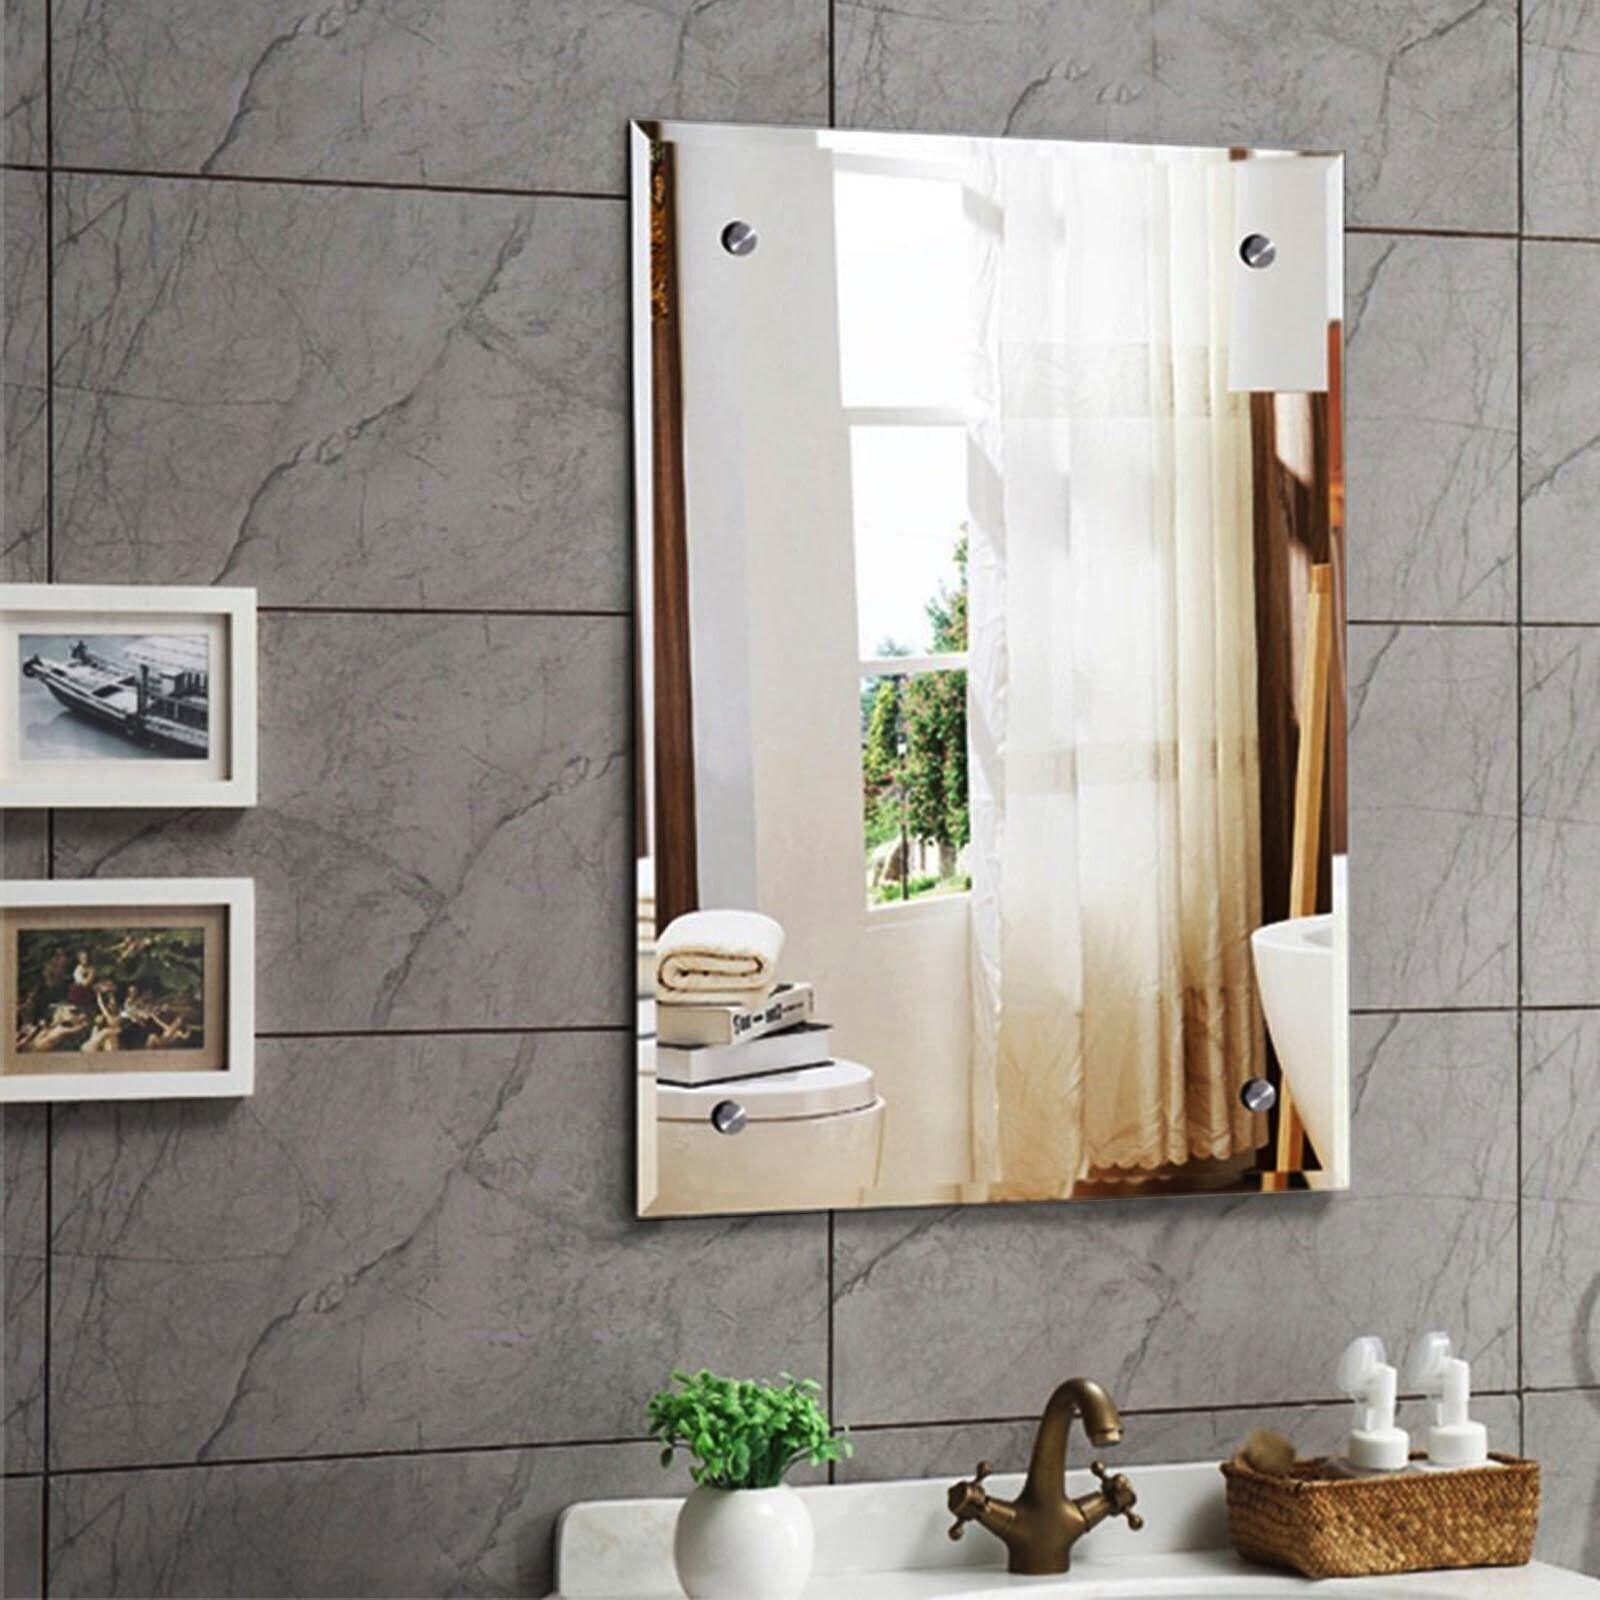 Frameless Bathroom Mirror with Pre Drilled Holes &Chrome ...